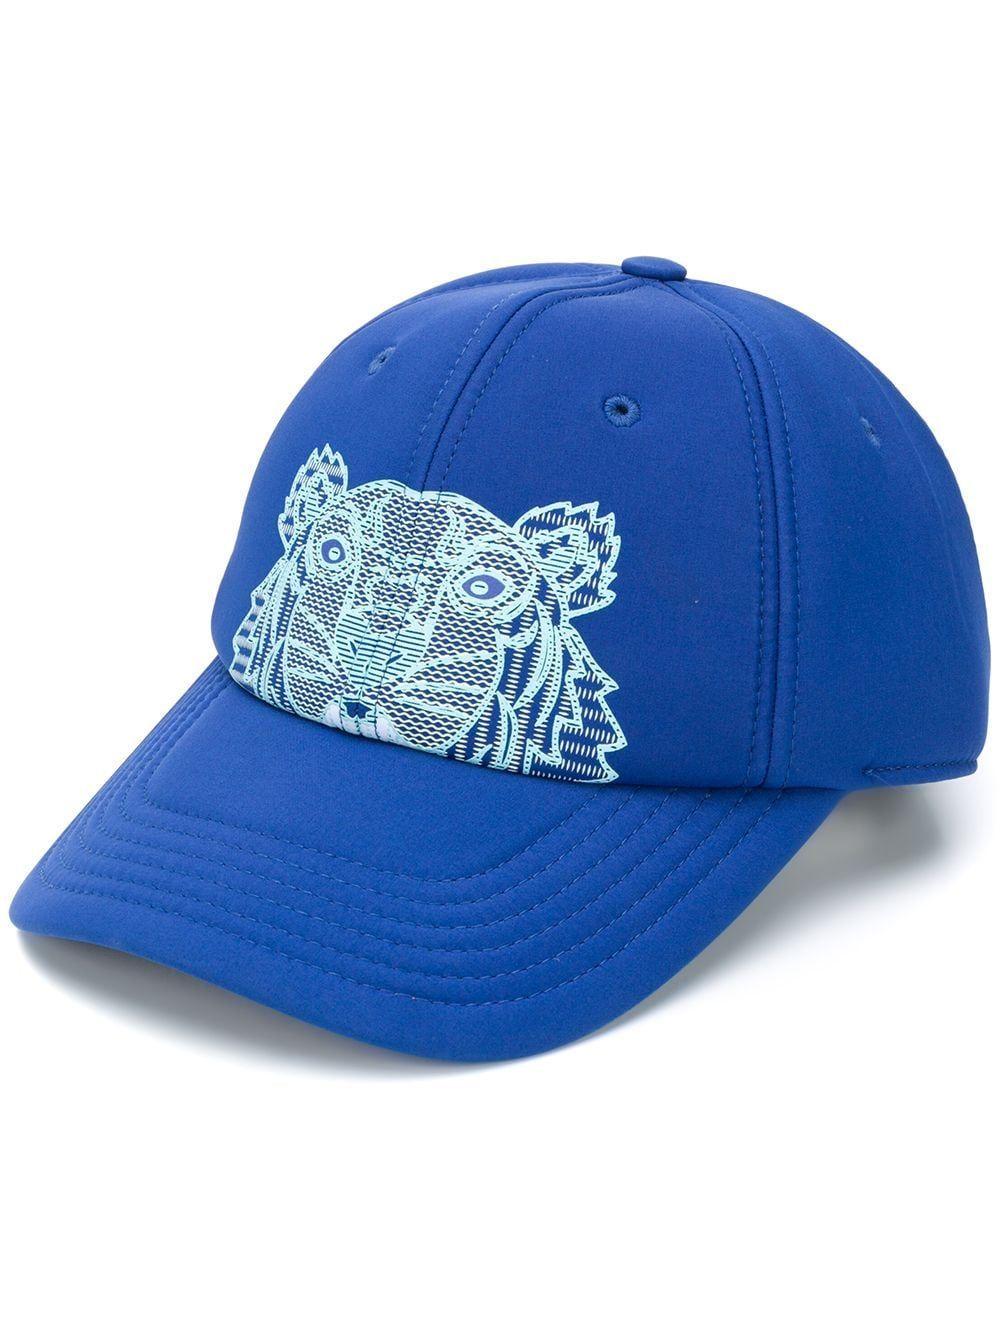 KENZO MEN'S FA55AC301F2276 BLUE POLYESTER HAT